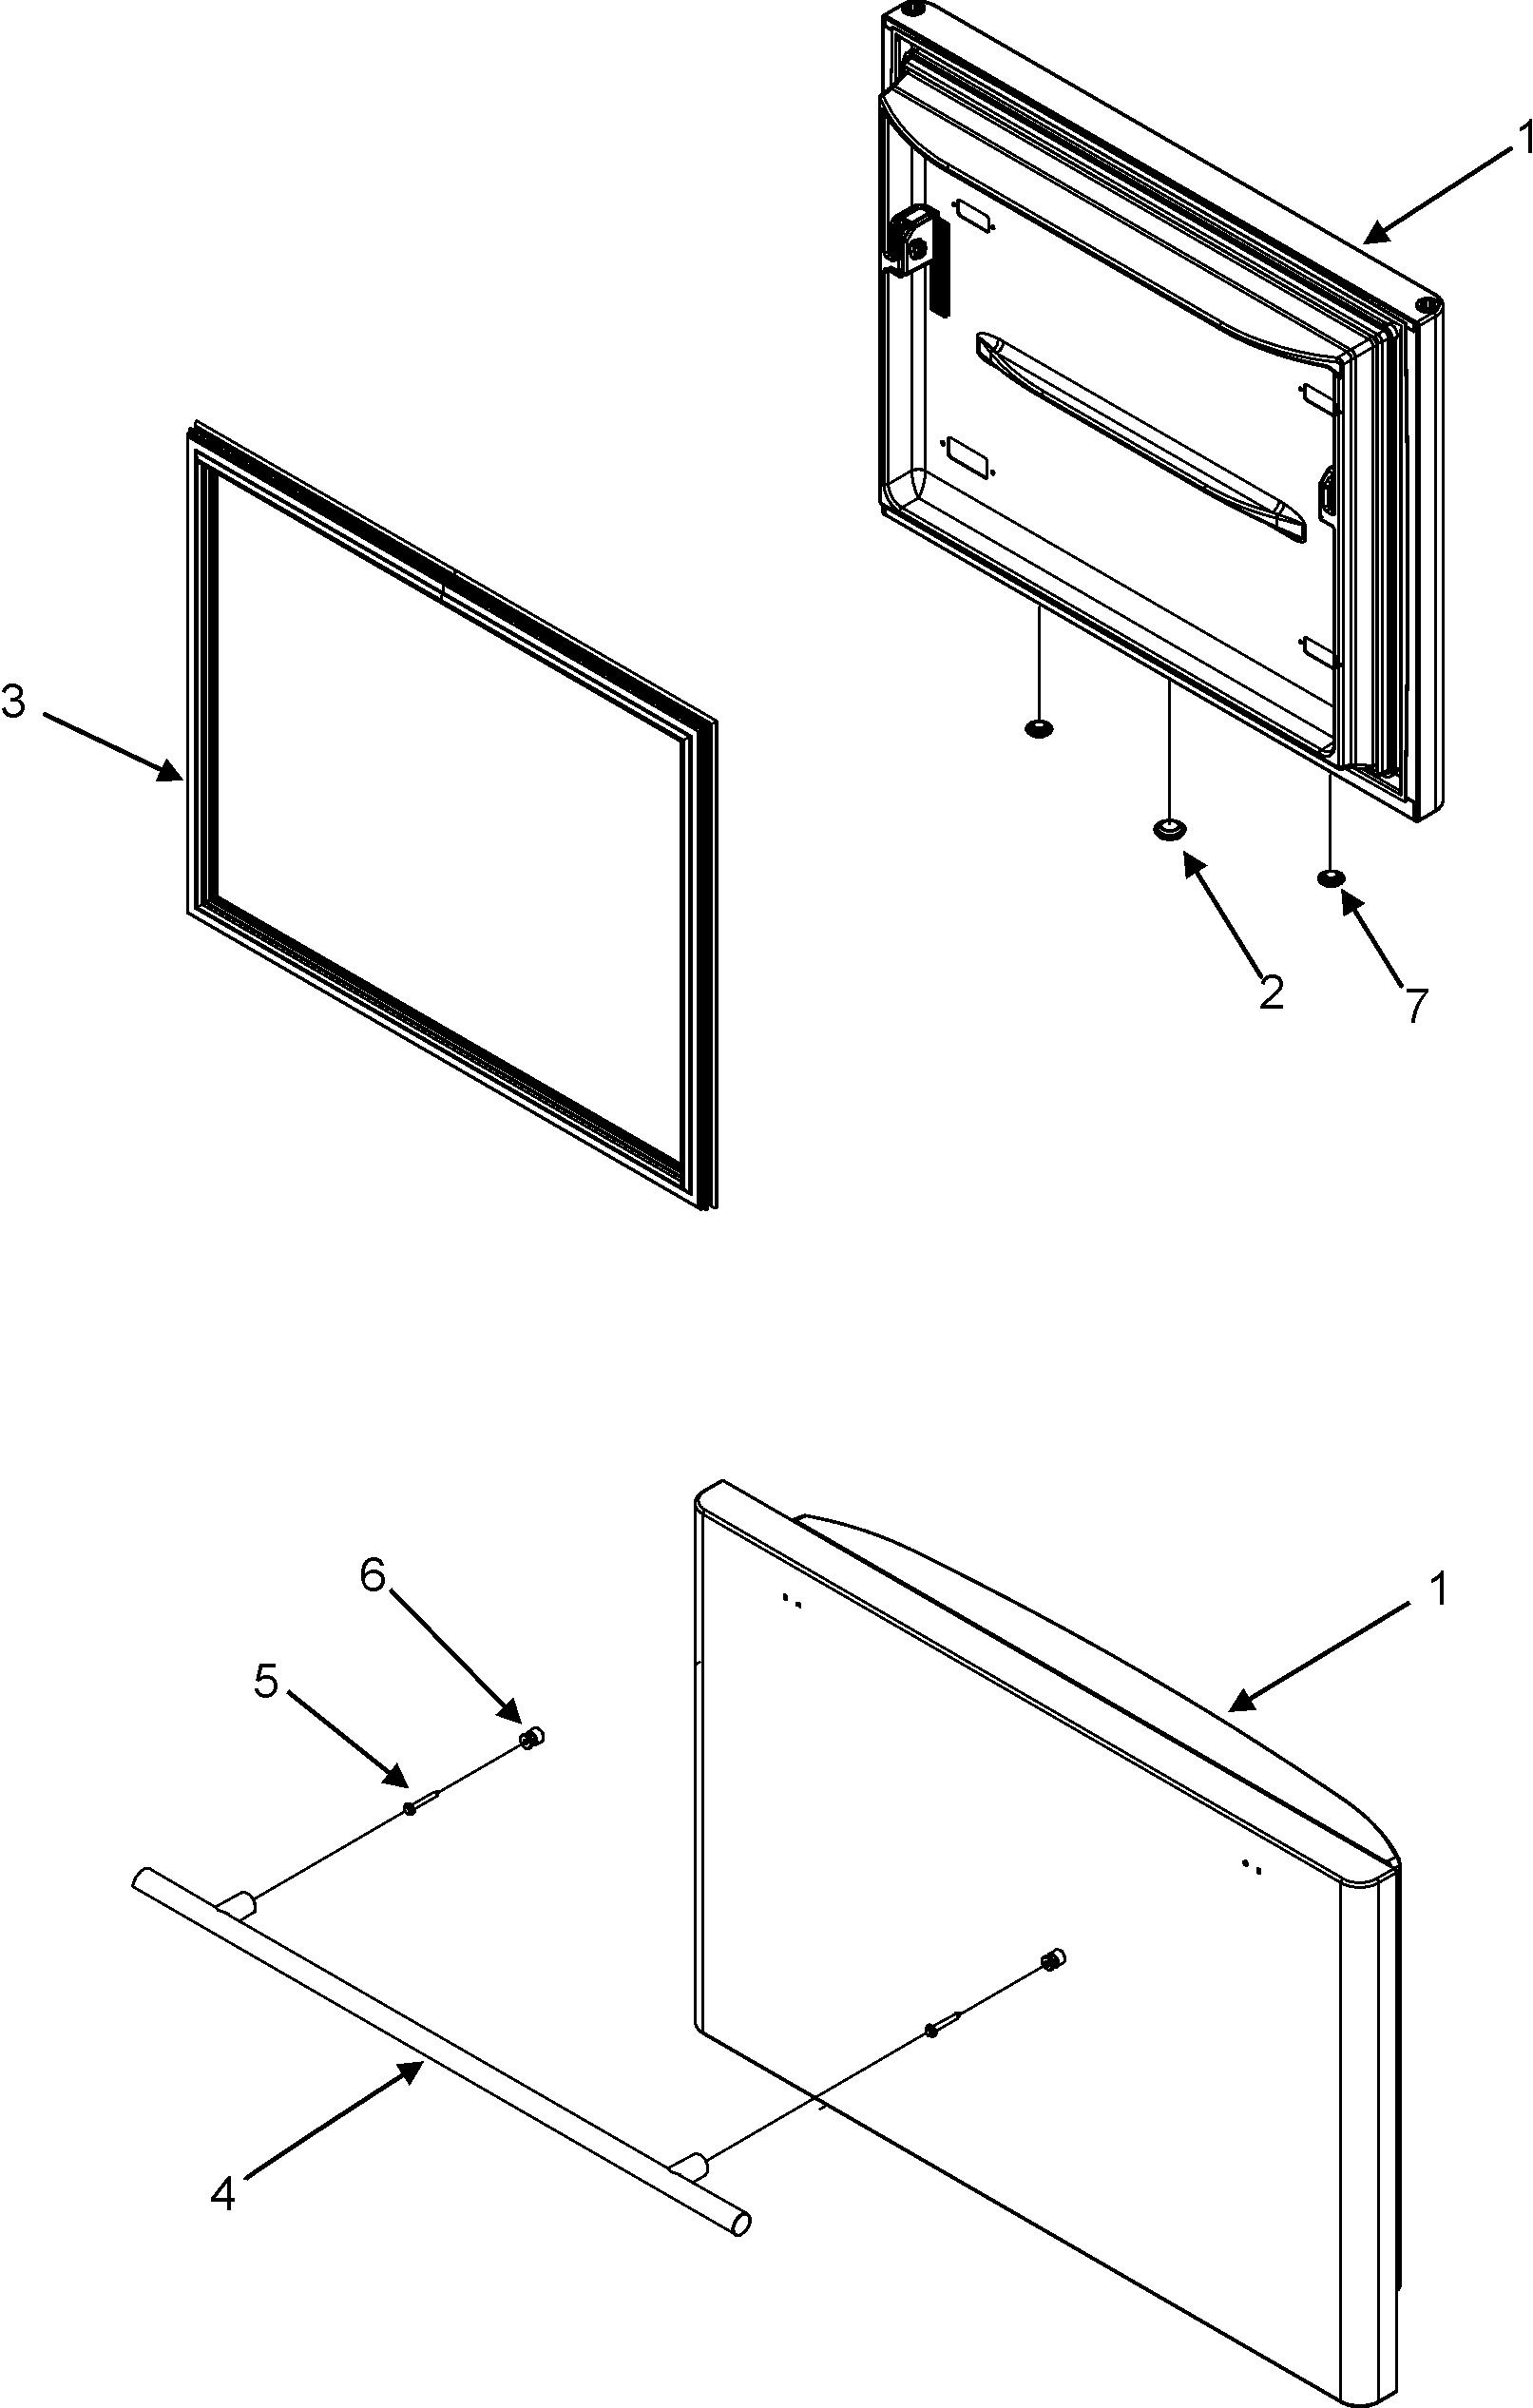 hight resolution of jenn air jenn air refrigeration parts model jbl2088hes sears refrigerator cooling diagram singer refrigerator wiring diagram